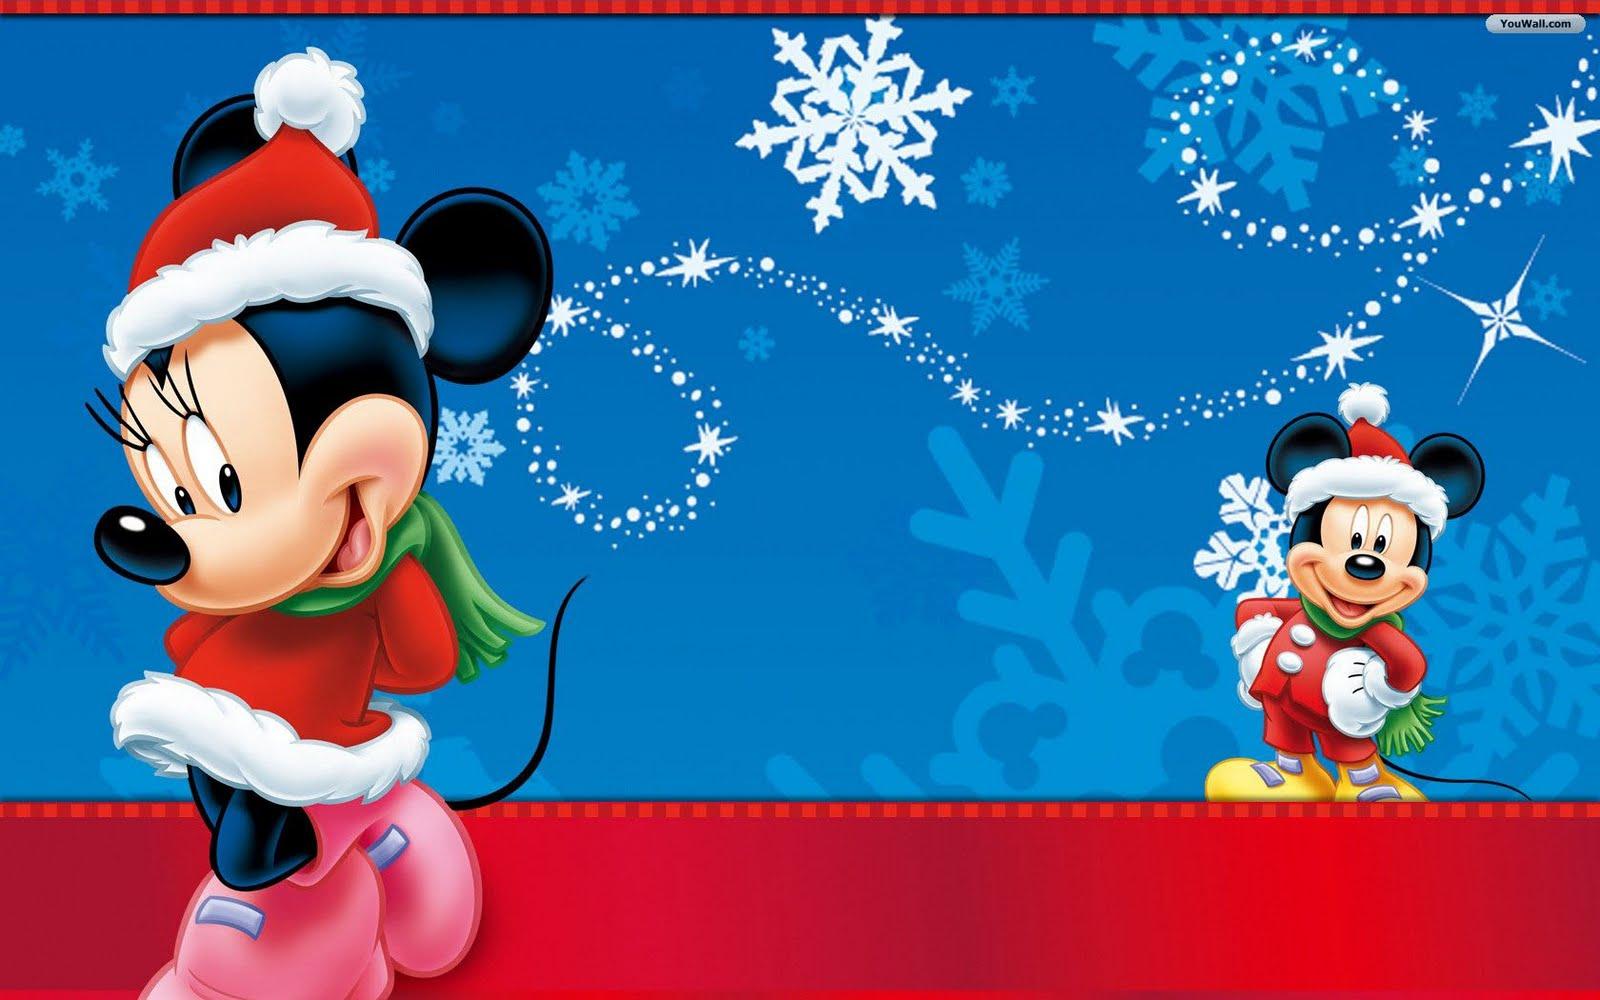 Holiday Computer Wallpaper Winter Wallpaper Christmas Screensavers 1600x1000